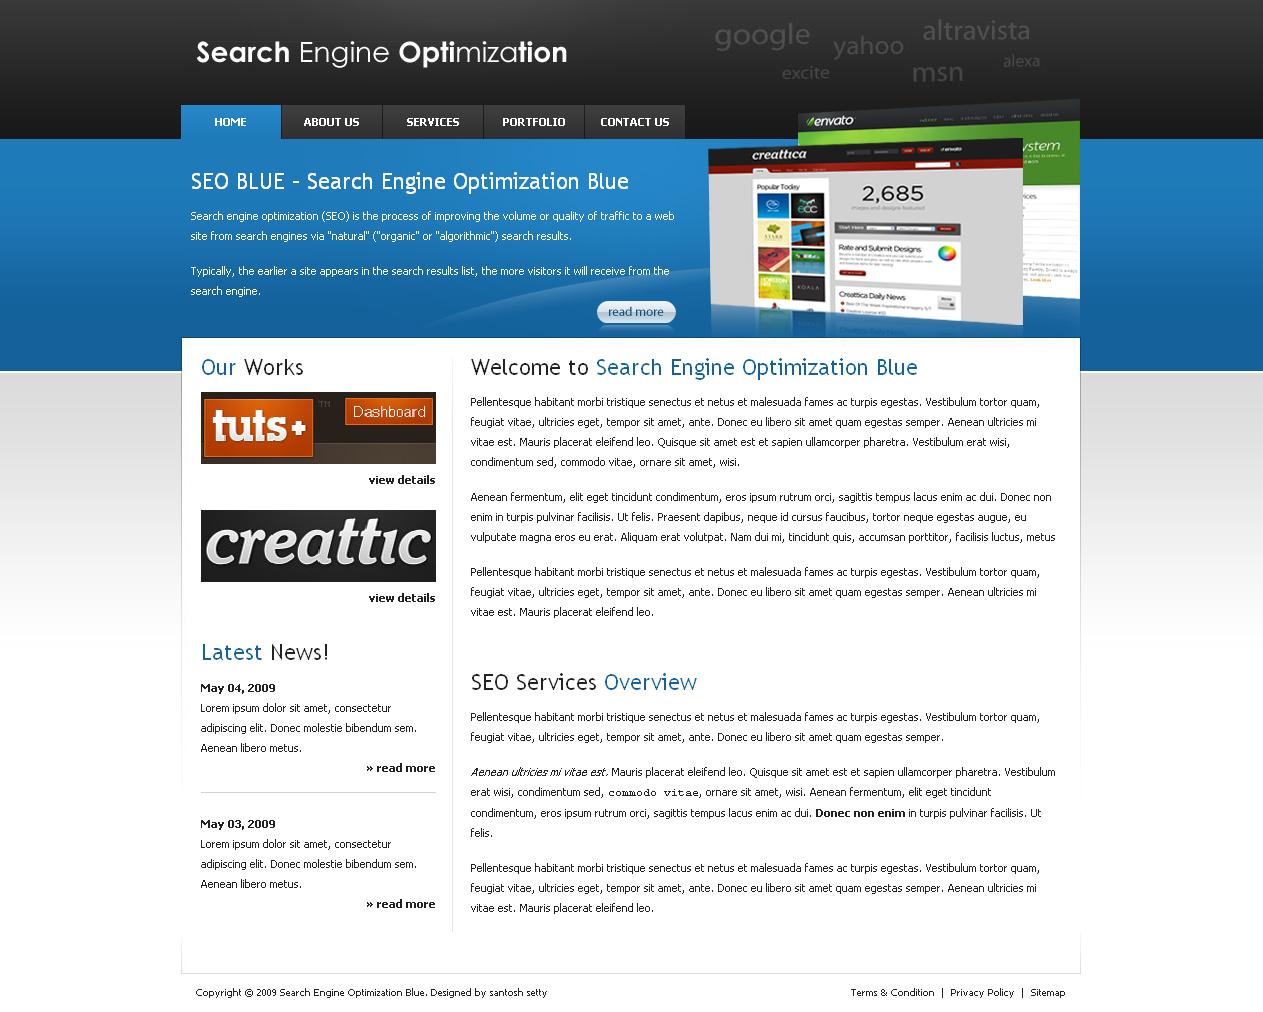 SEOBLUE - Home Page of SEOBLUE